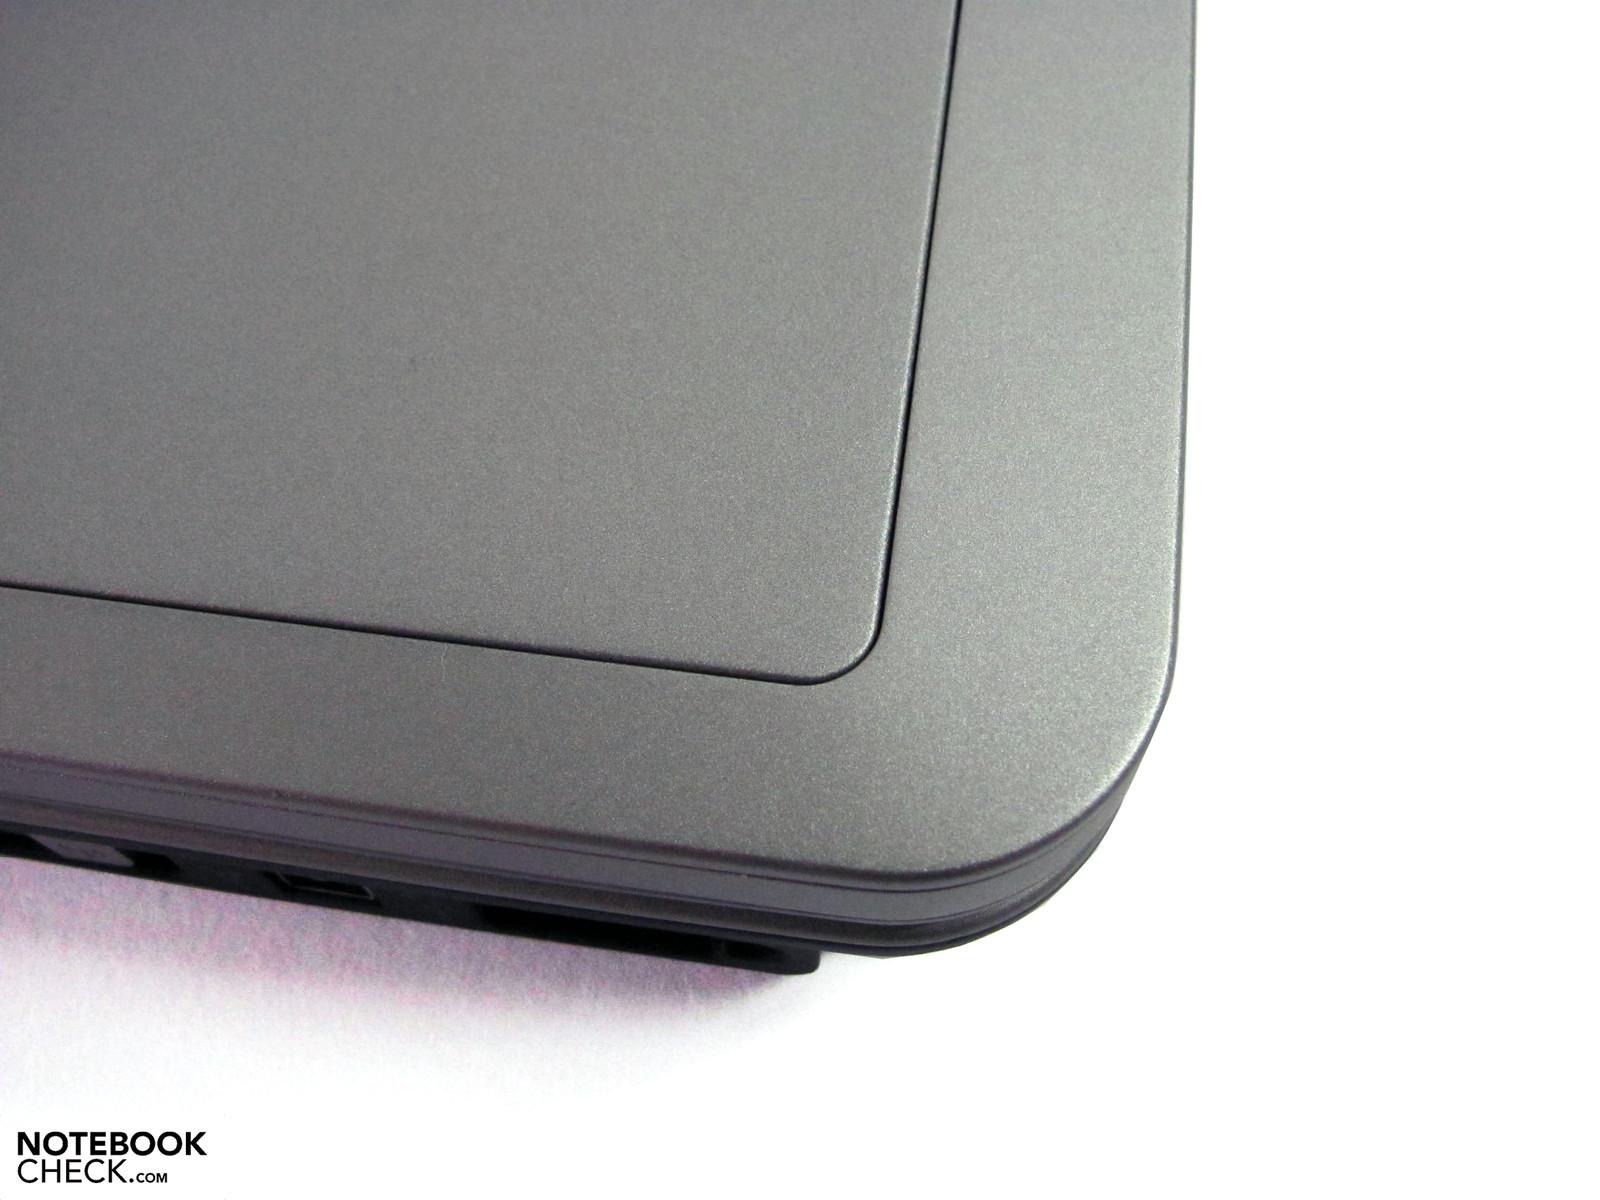 HP G60-243CL Notebook Realtek Card Reader Drivers Download (2019)